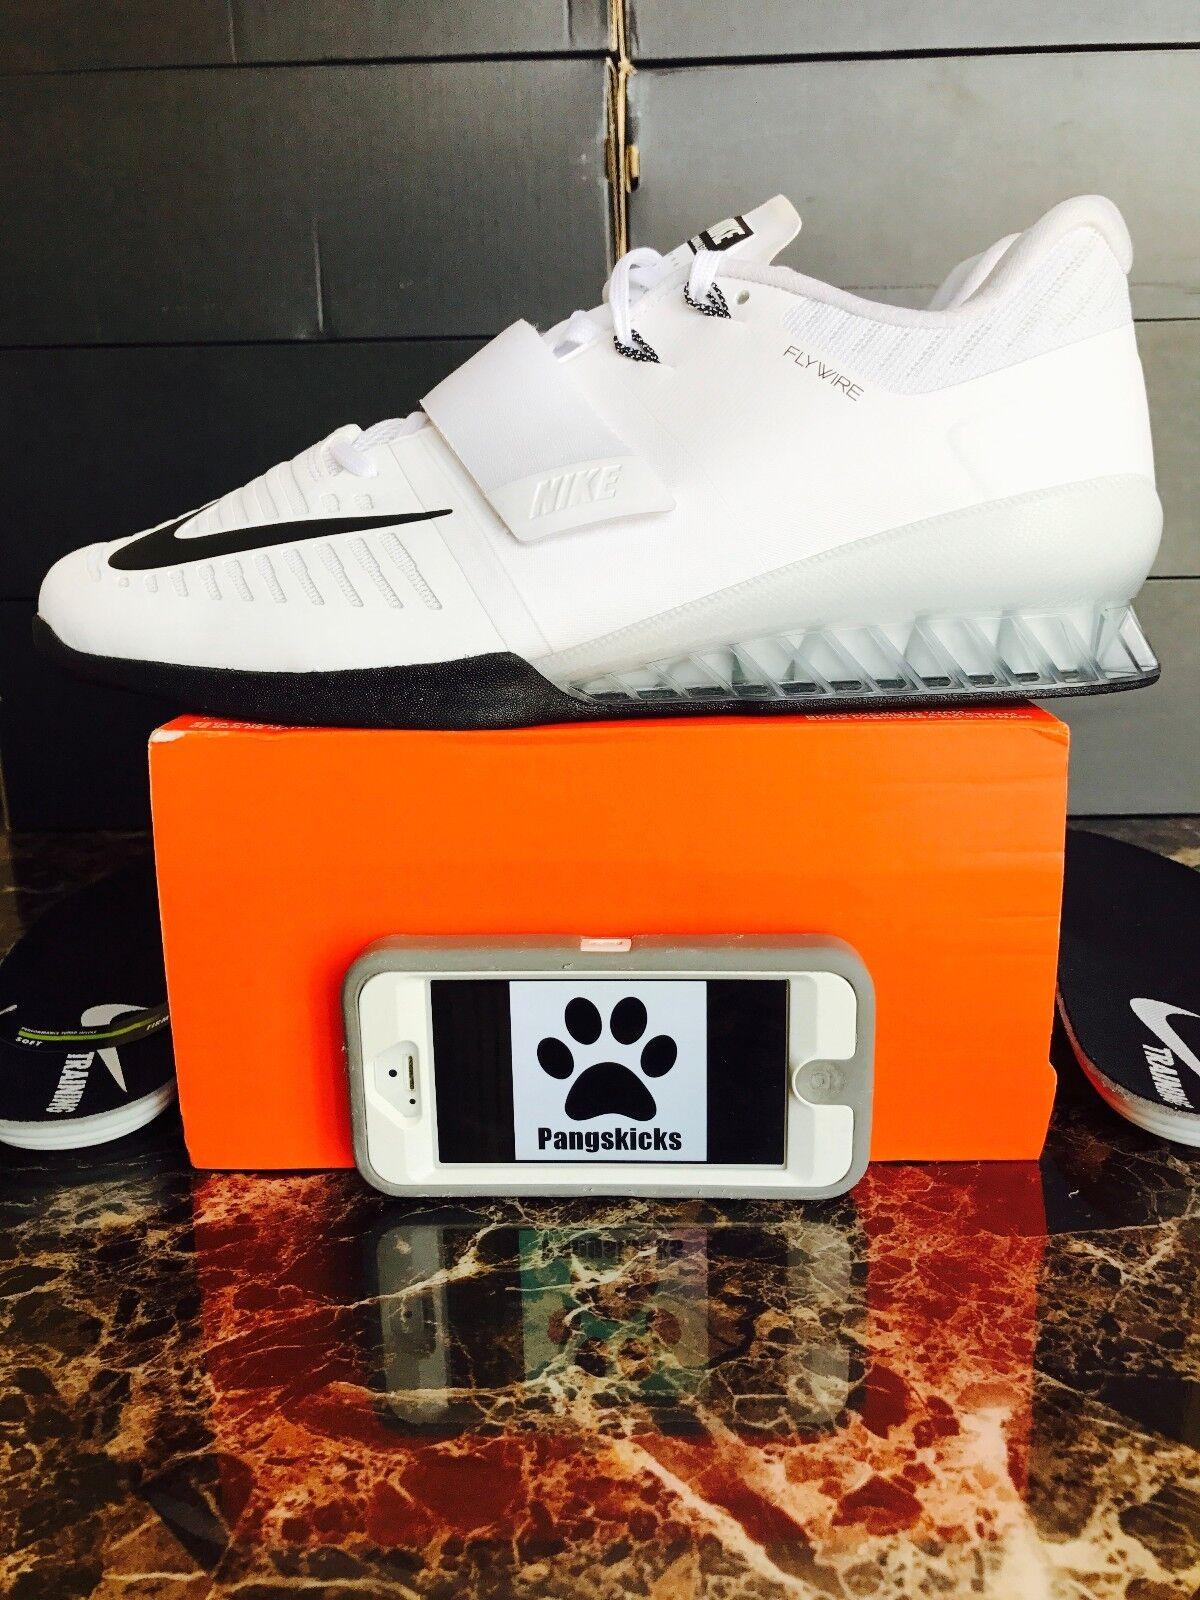 Nike Romaleos 3 Weightlifting White Black 852933-100 Size 11-14